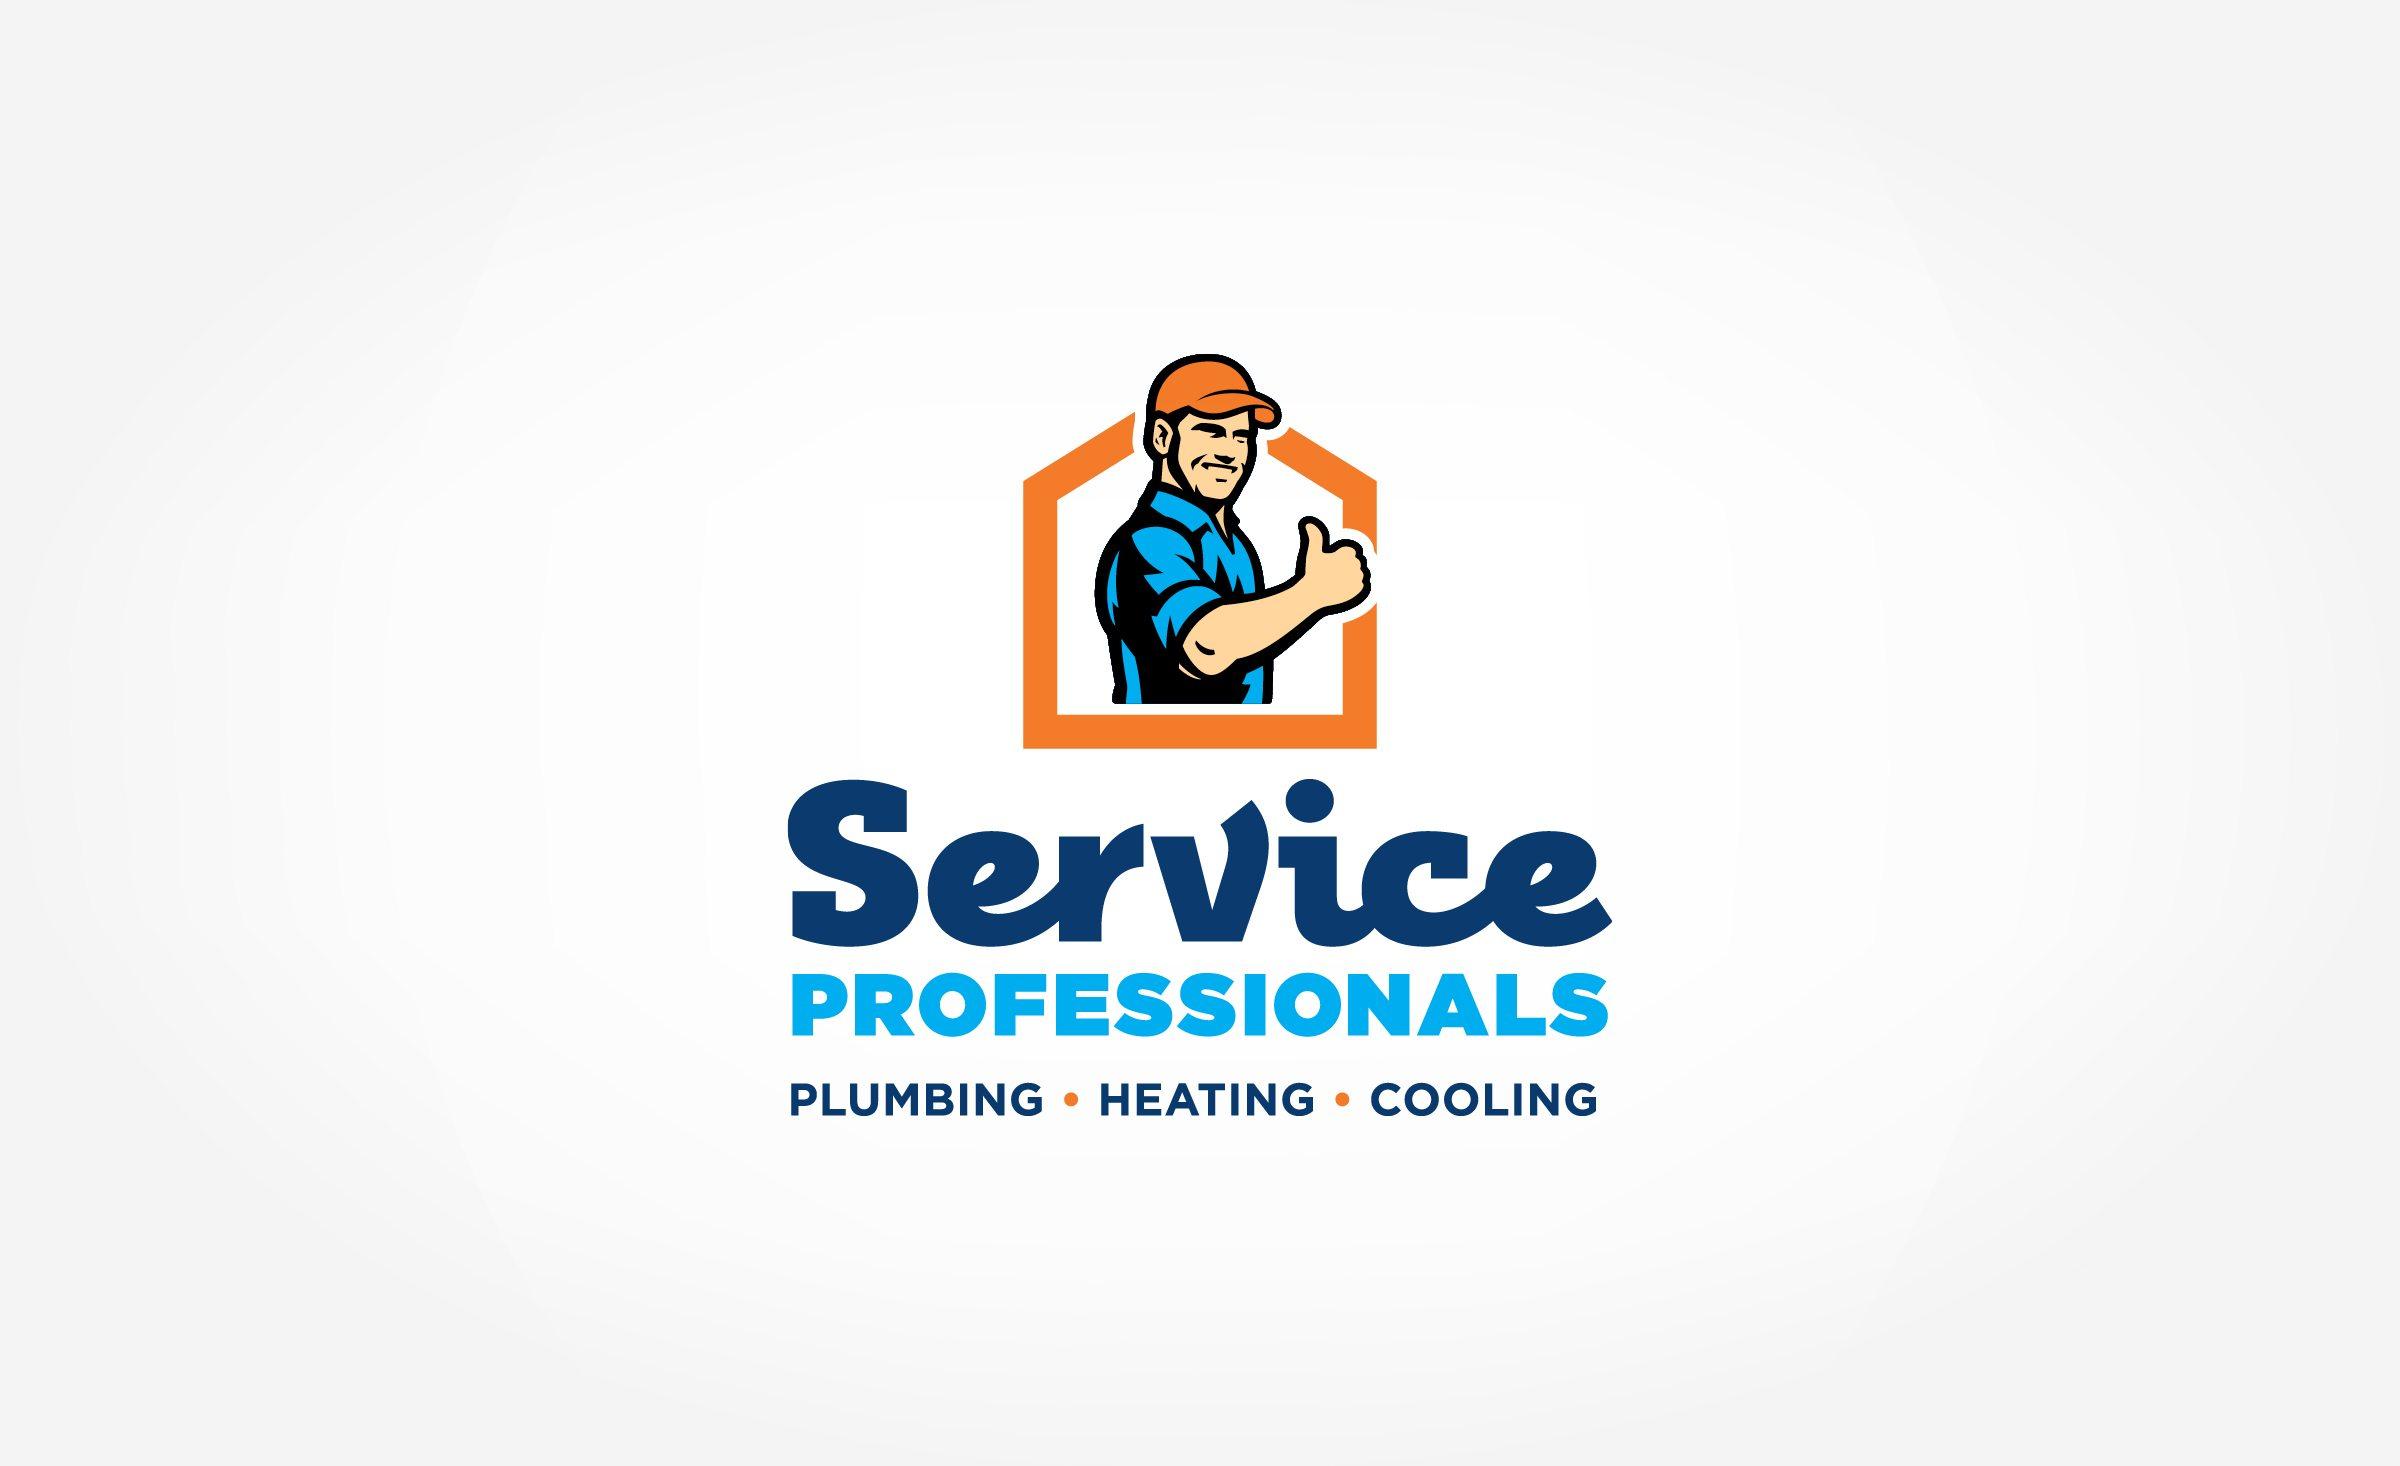 Plumbing Brand Building Basics - Graphic D-Signs, Inc.